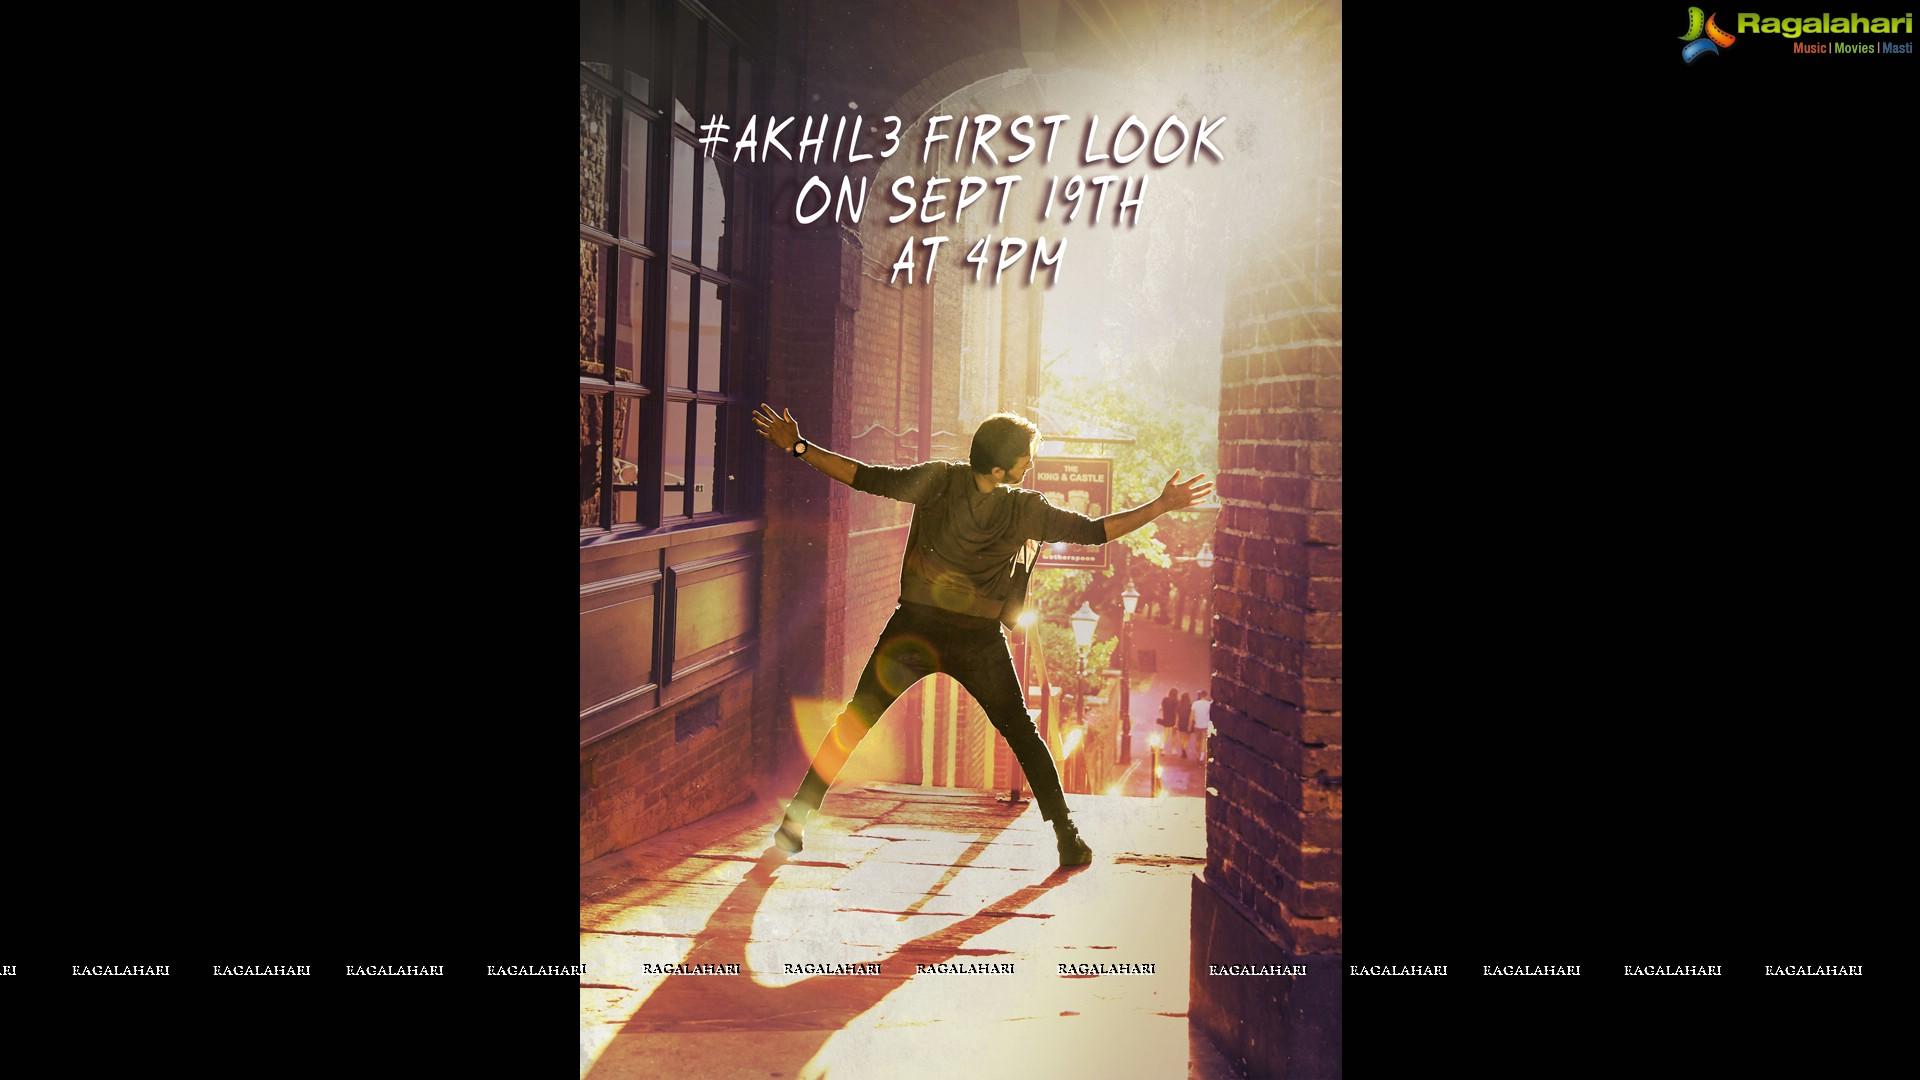 Akhil - Venky Atluri - SVCC Film Posters